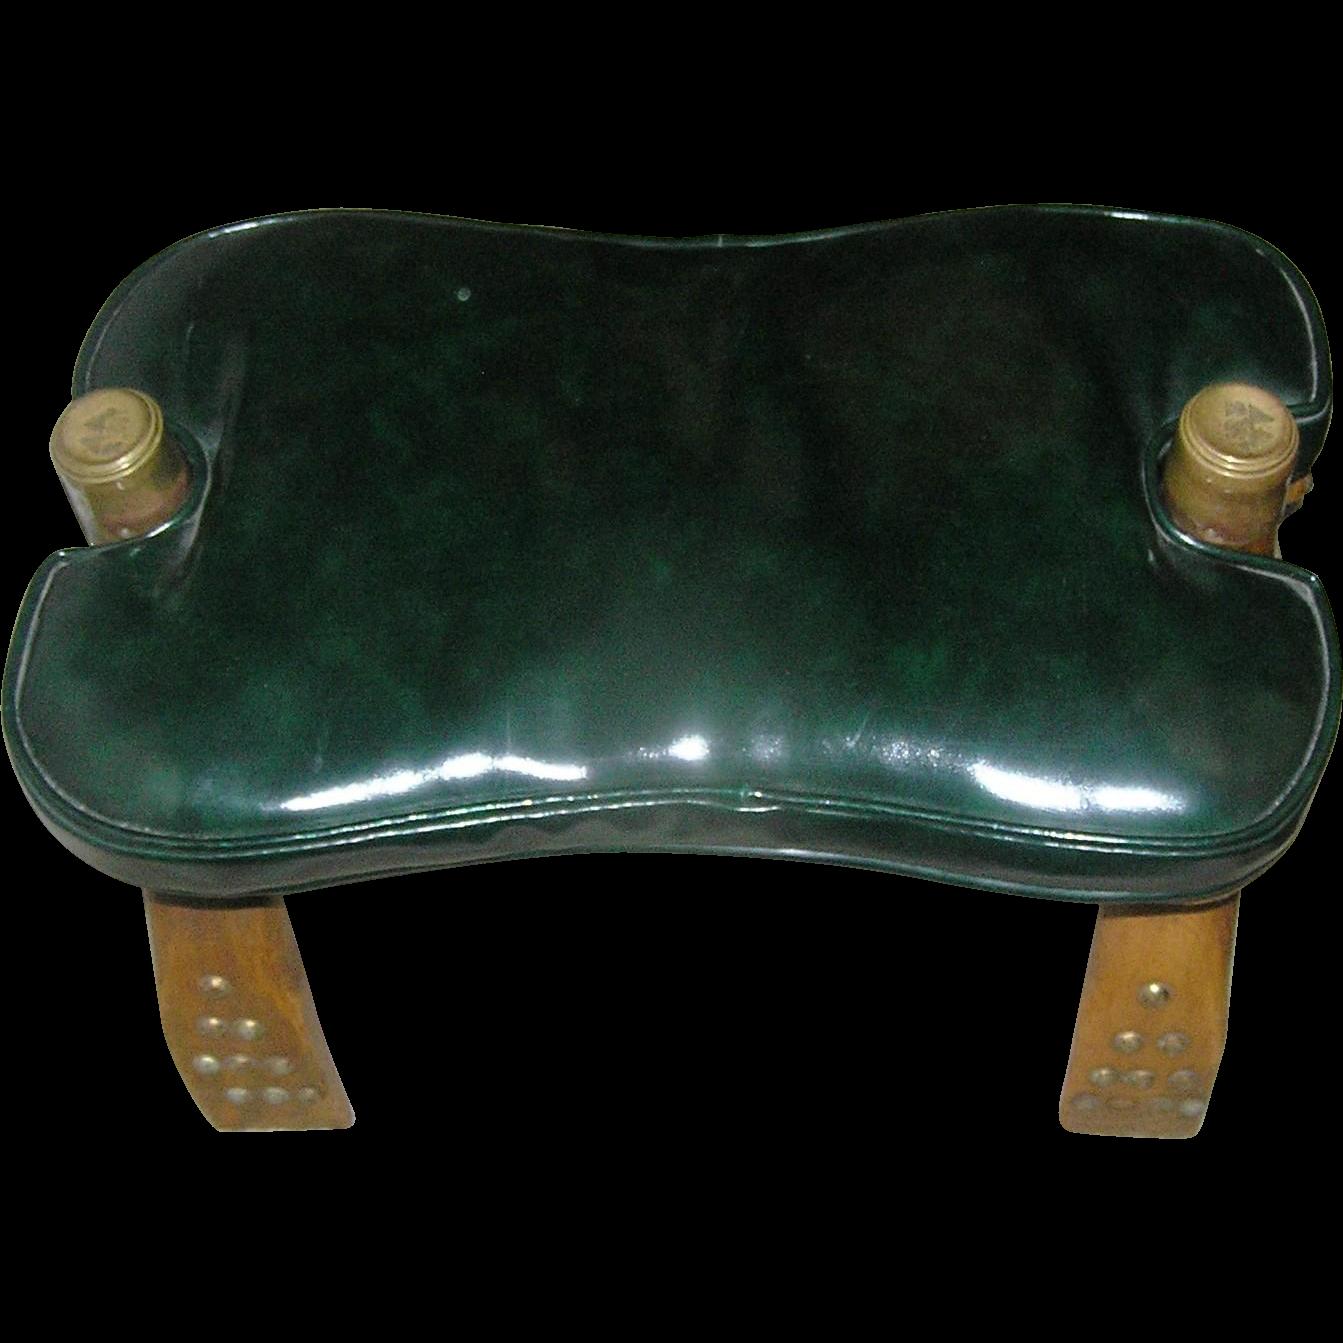 Camel back stool with a leather-like cushion of dark, dark ...